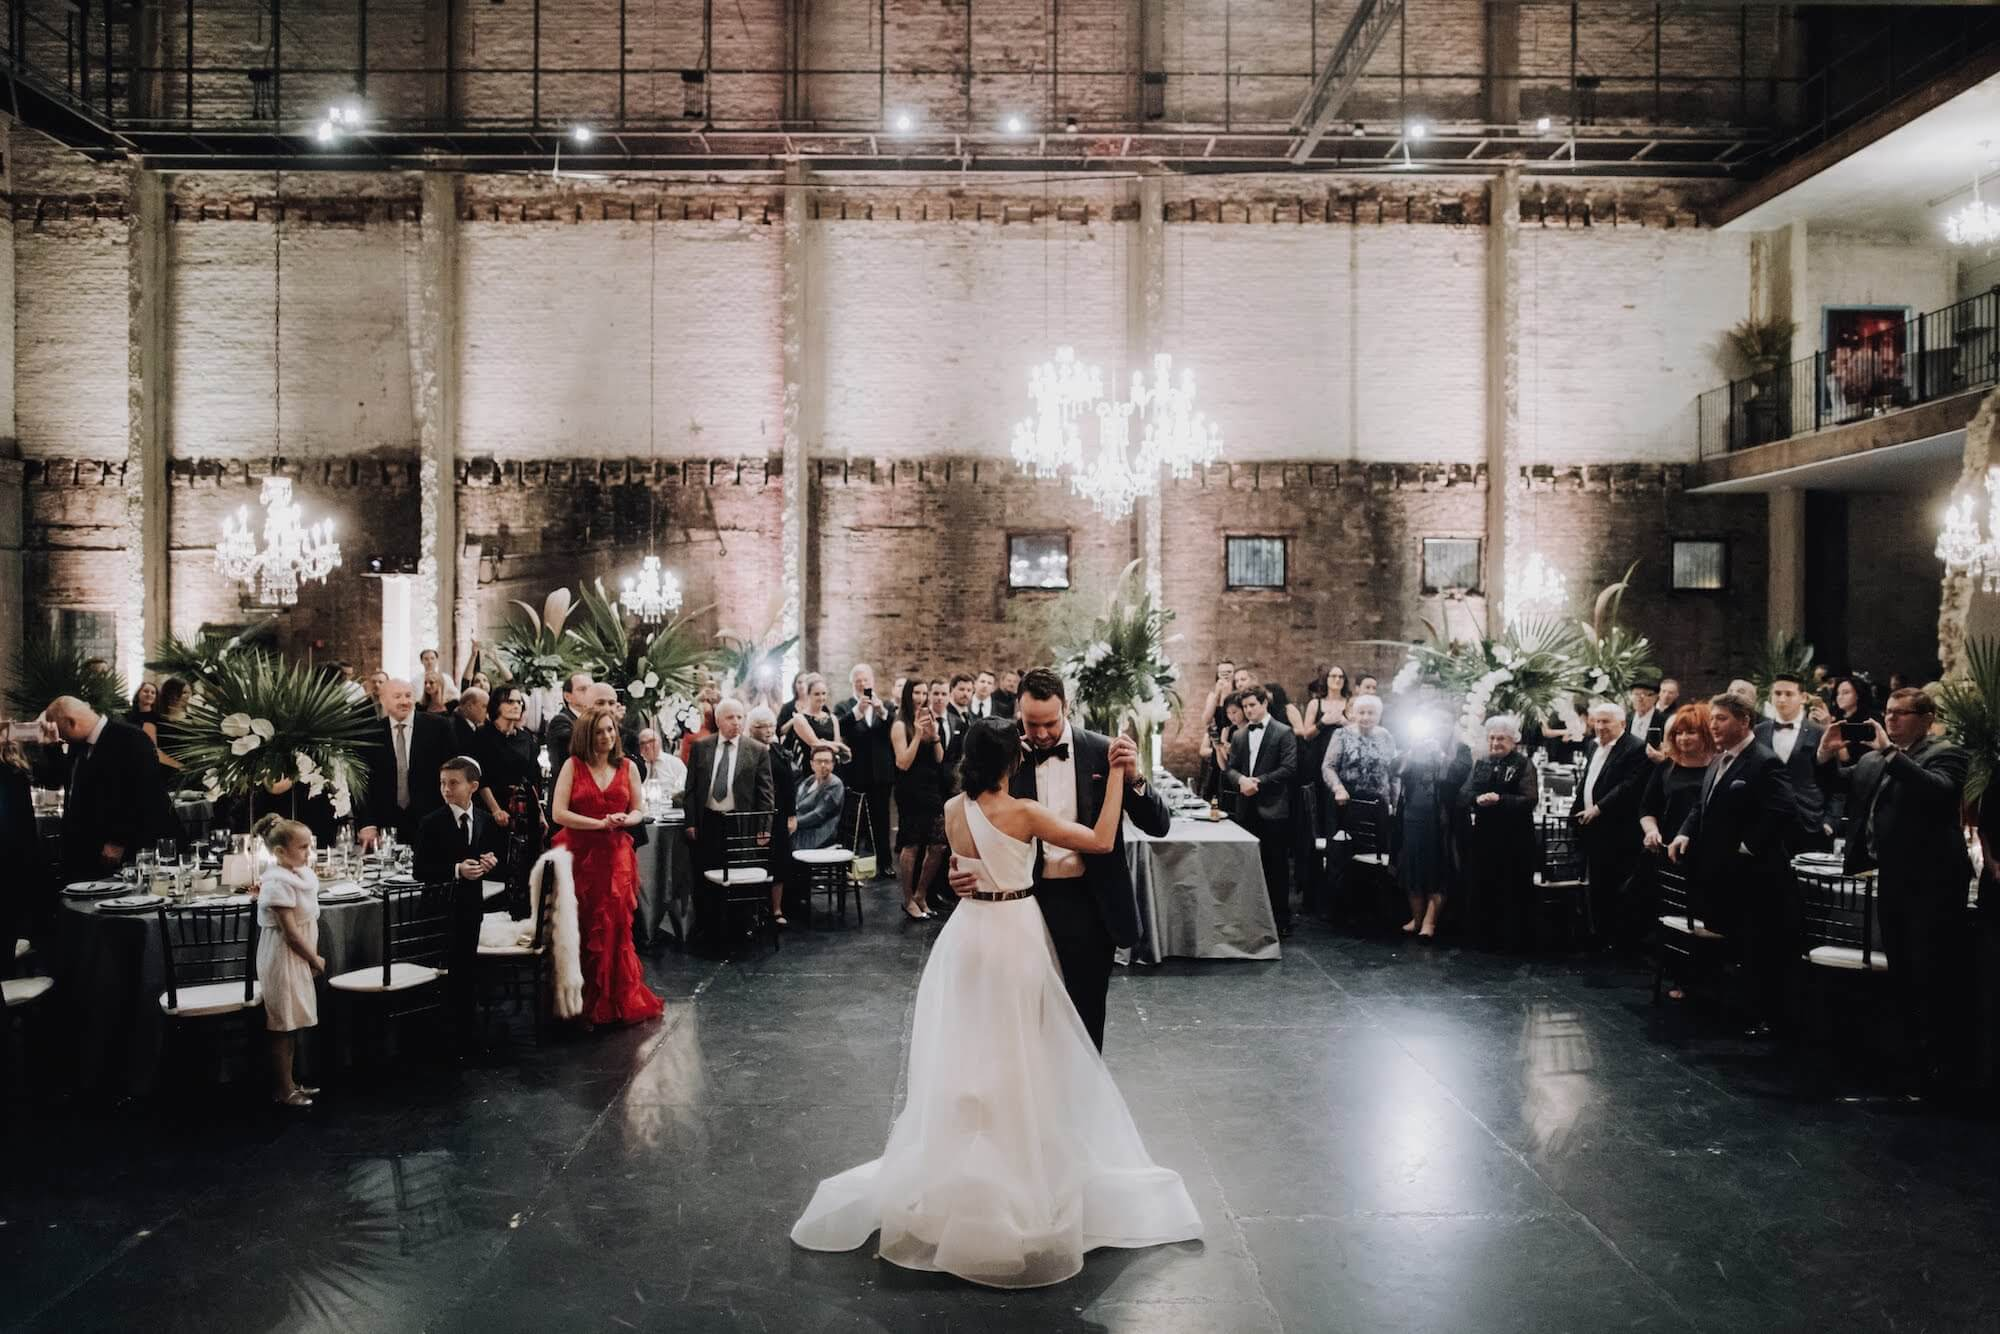 engle-olson-video-matt-lien-photography-rita-evan-wedding-35.jpg